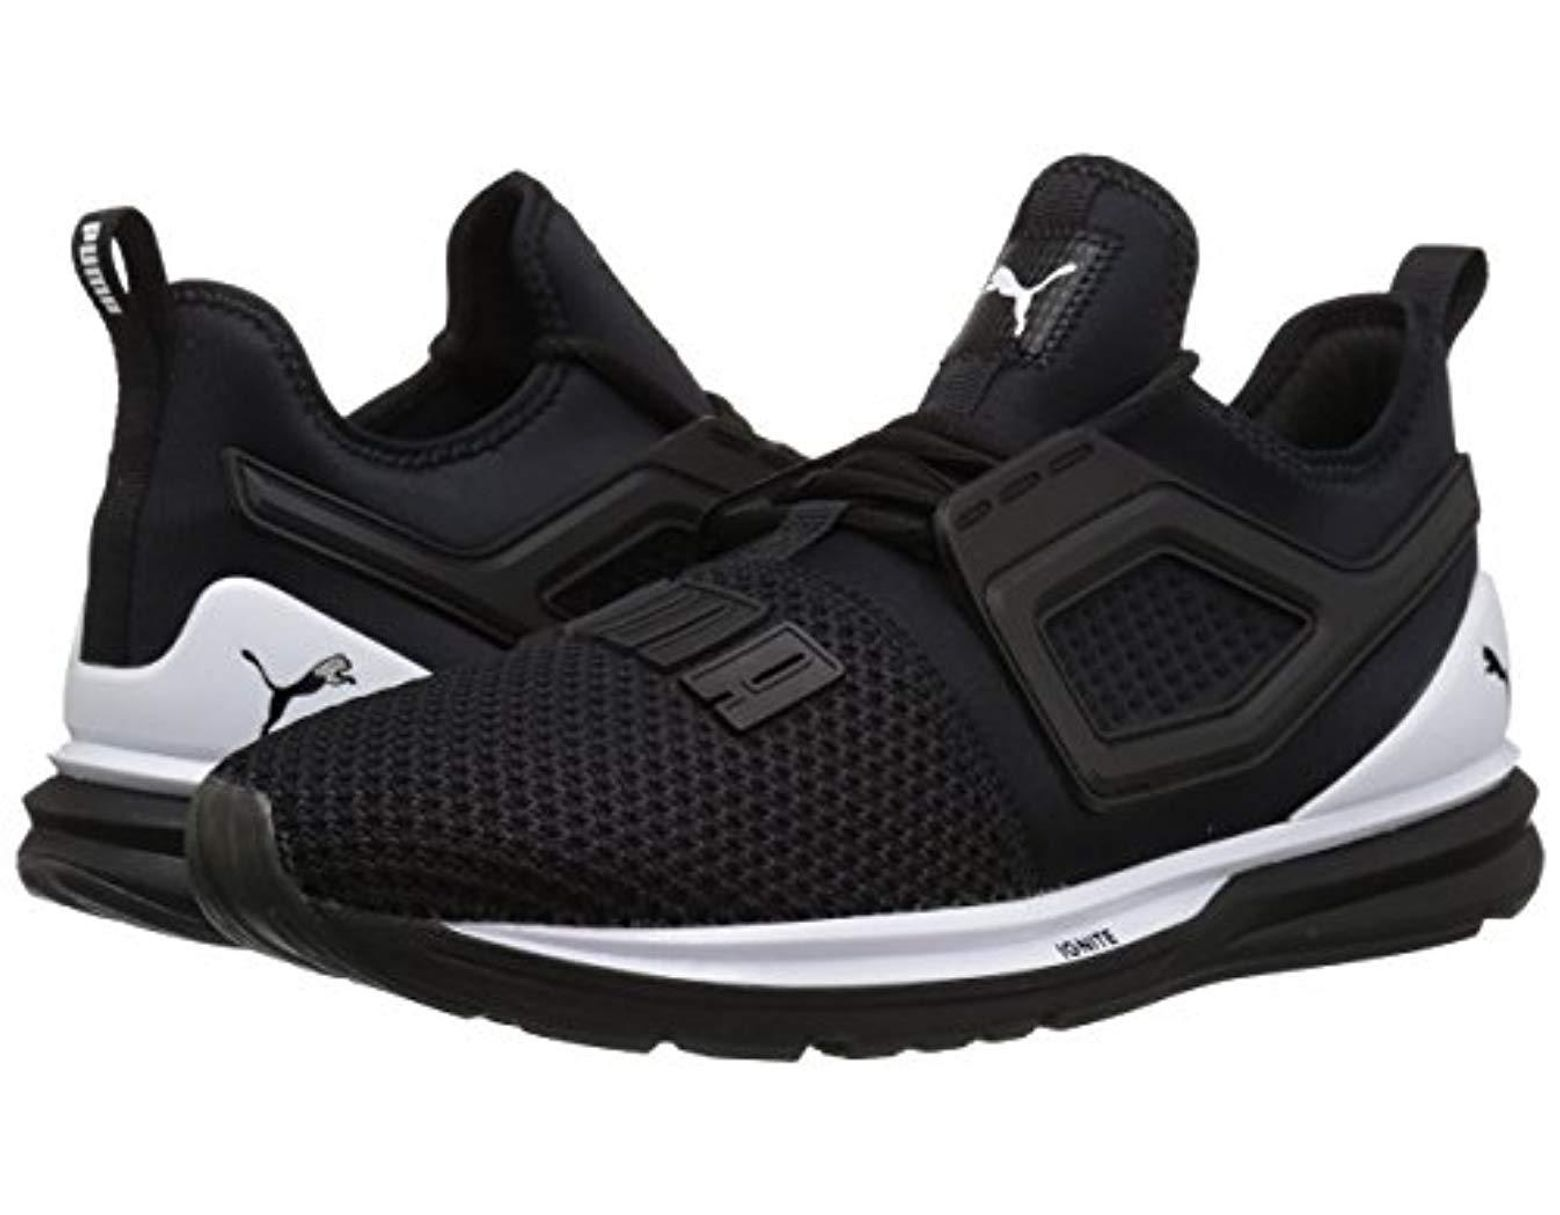 best sneakers df84b 1e8e7 Men's Black Ignite Limitless Trainer